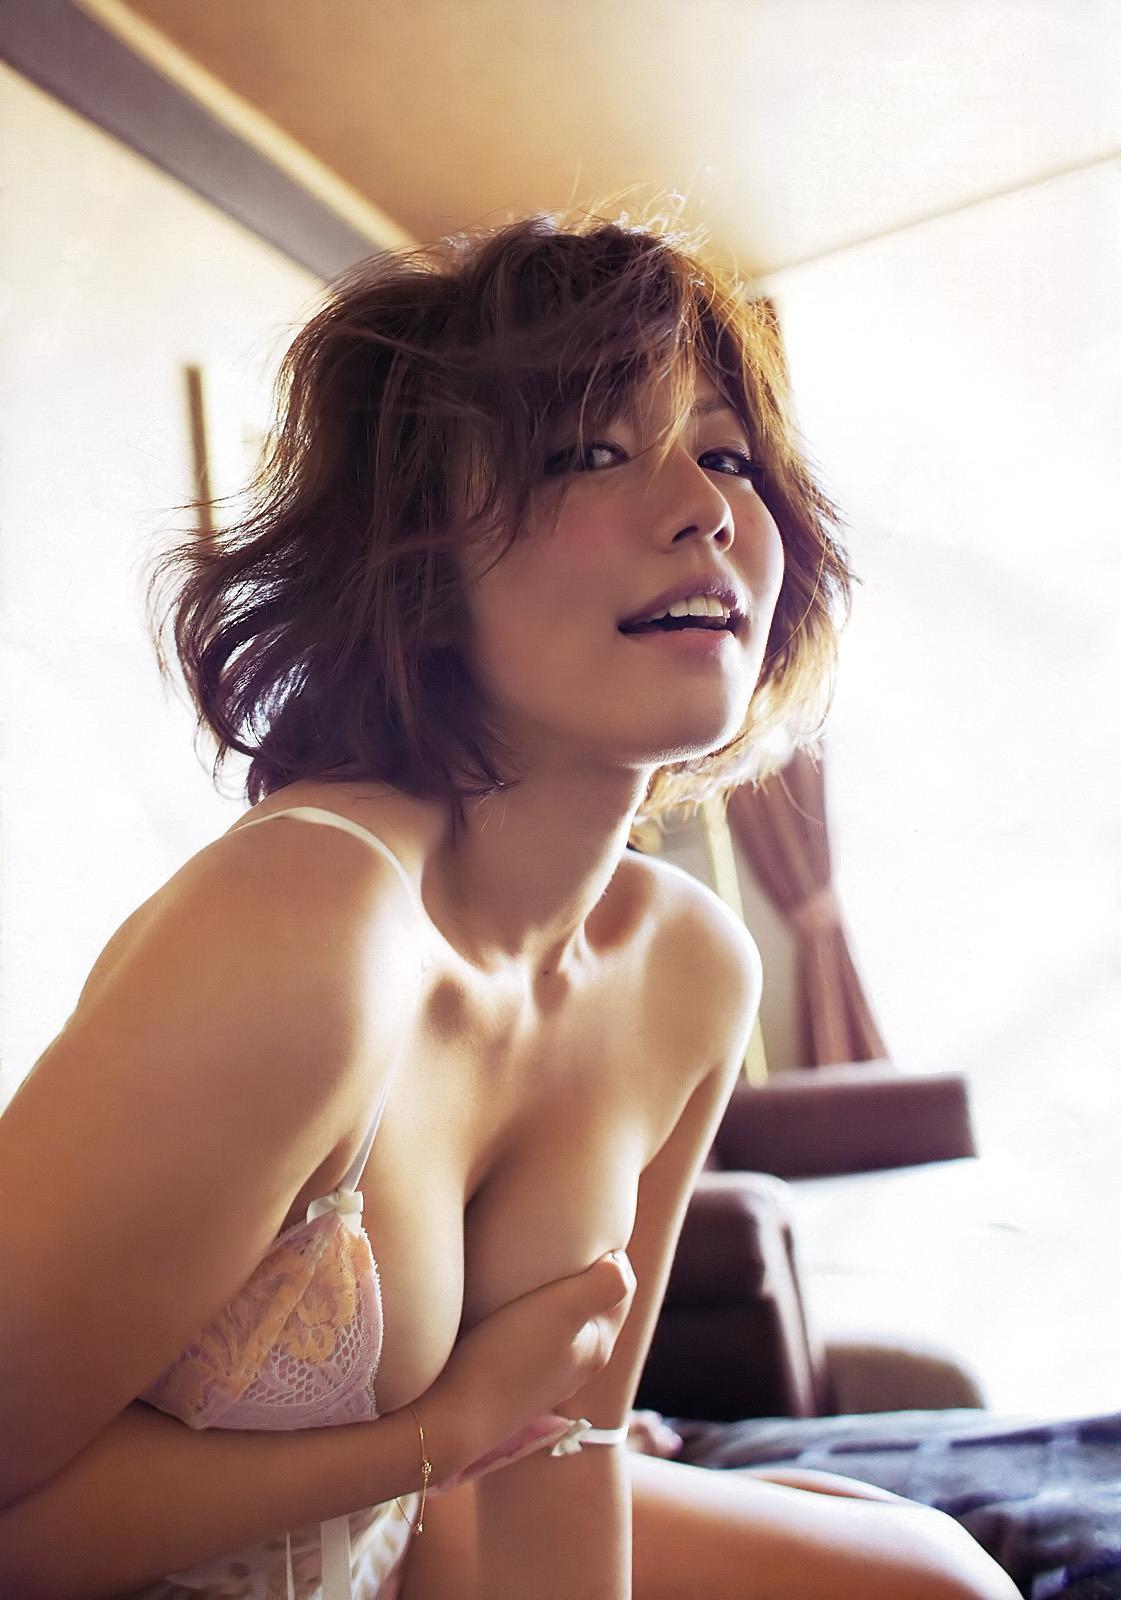 gs_isoyamasayaka_001_007.jpg